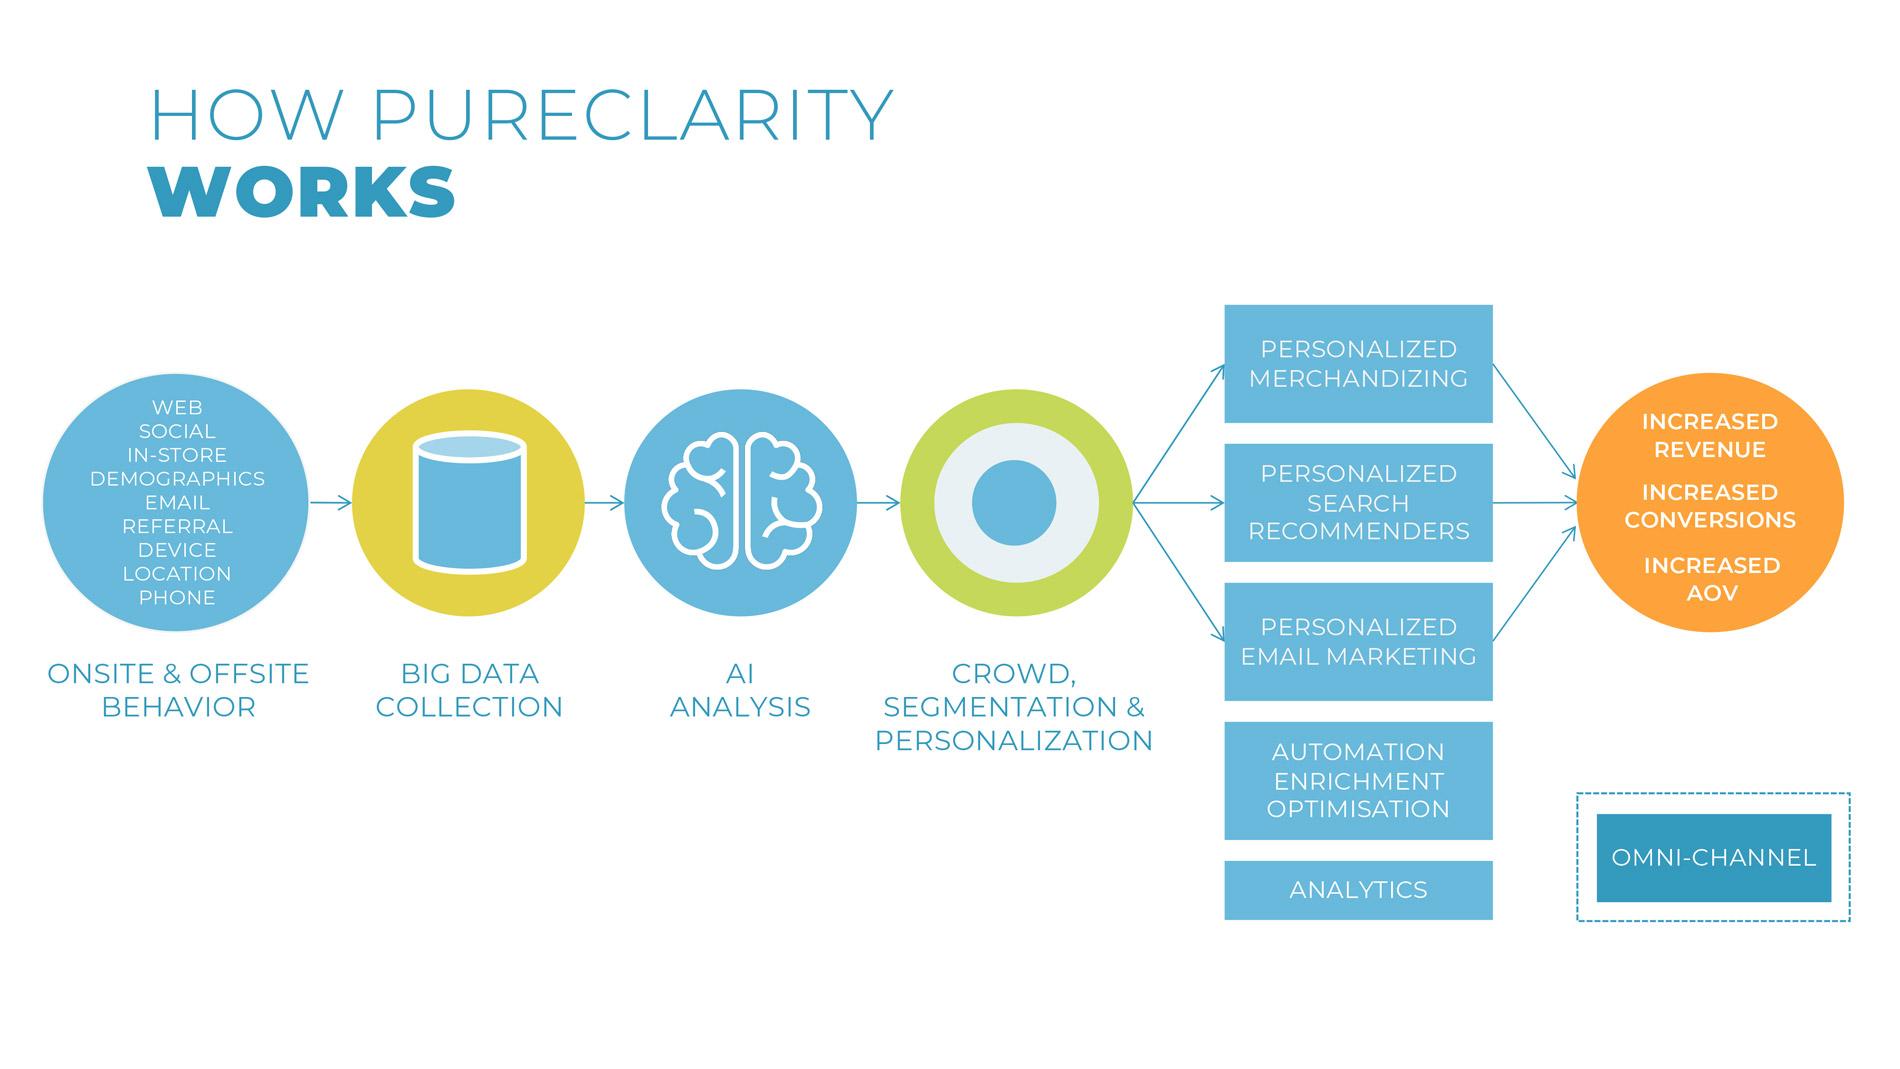 How PureClarity works. <em>(Click to enlarge.)</em>